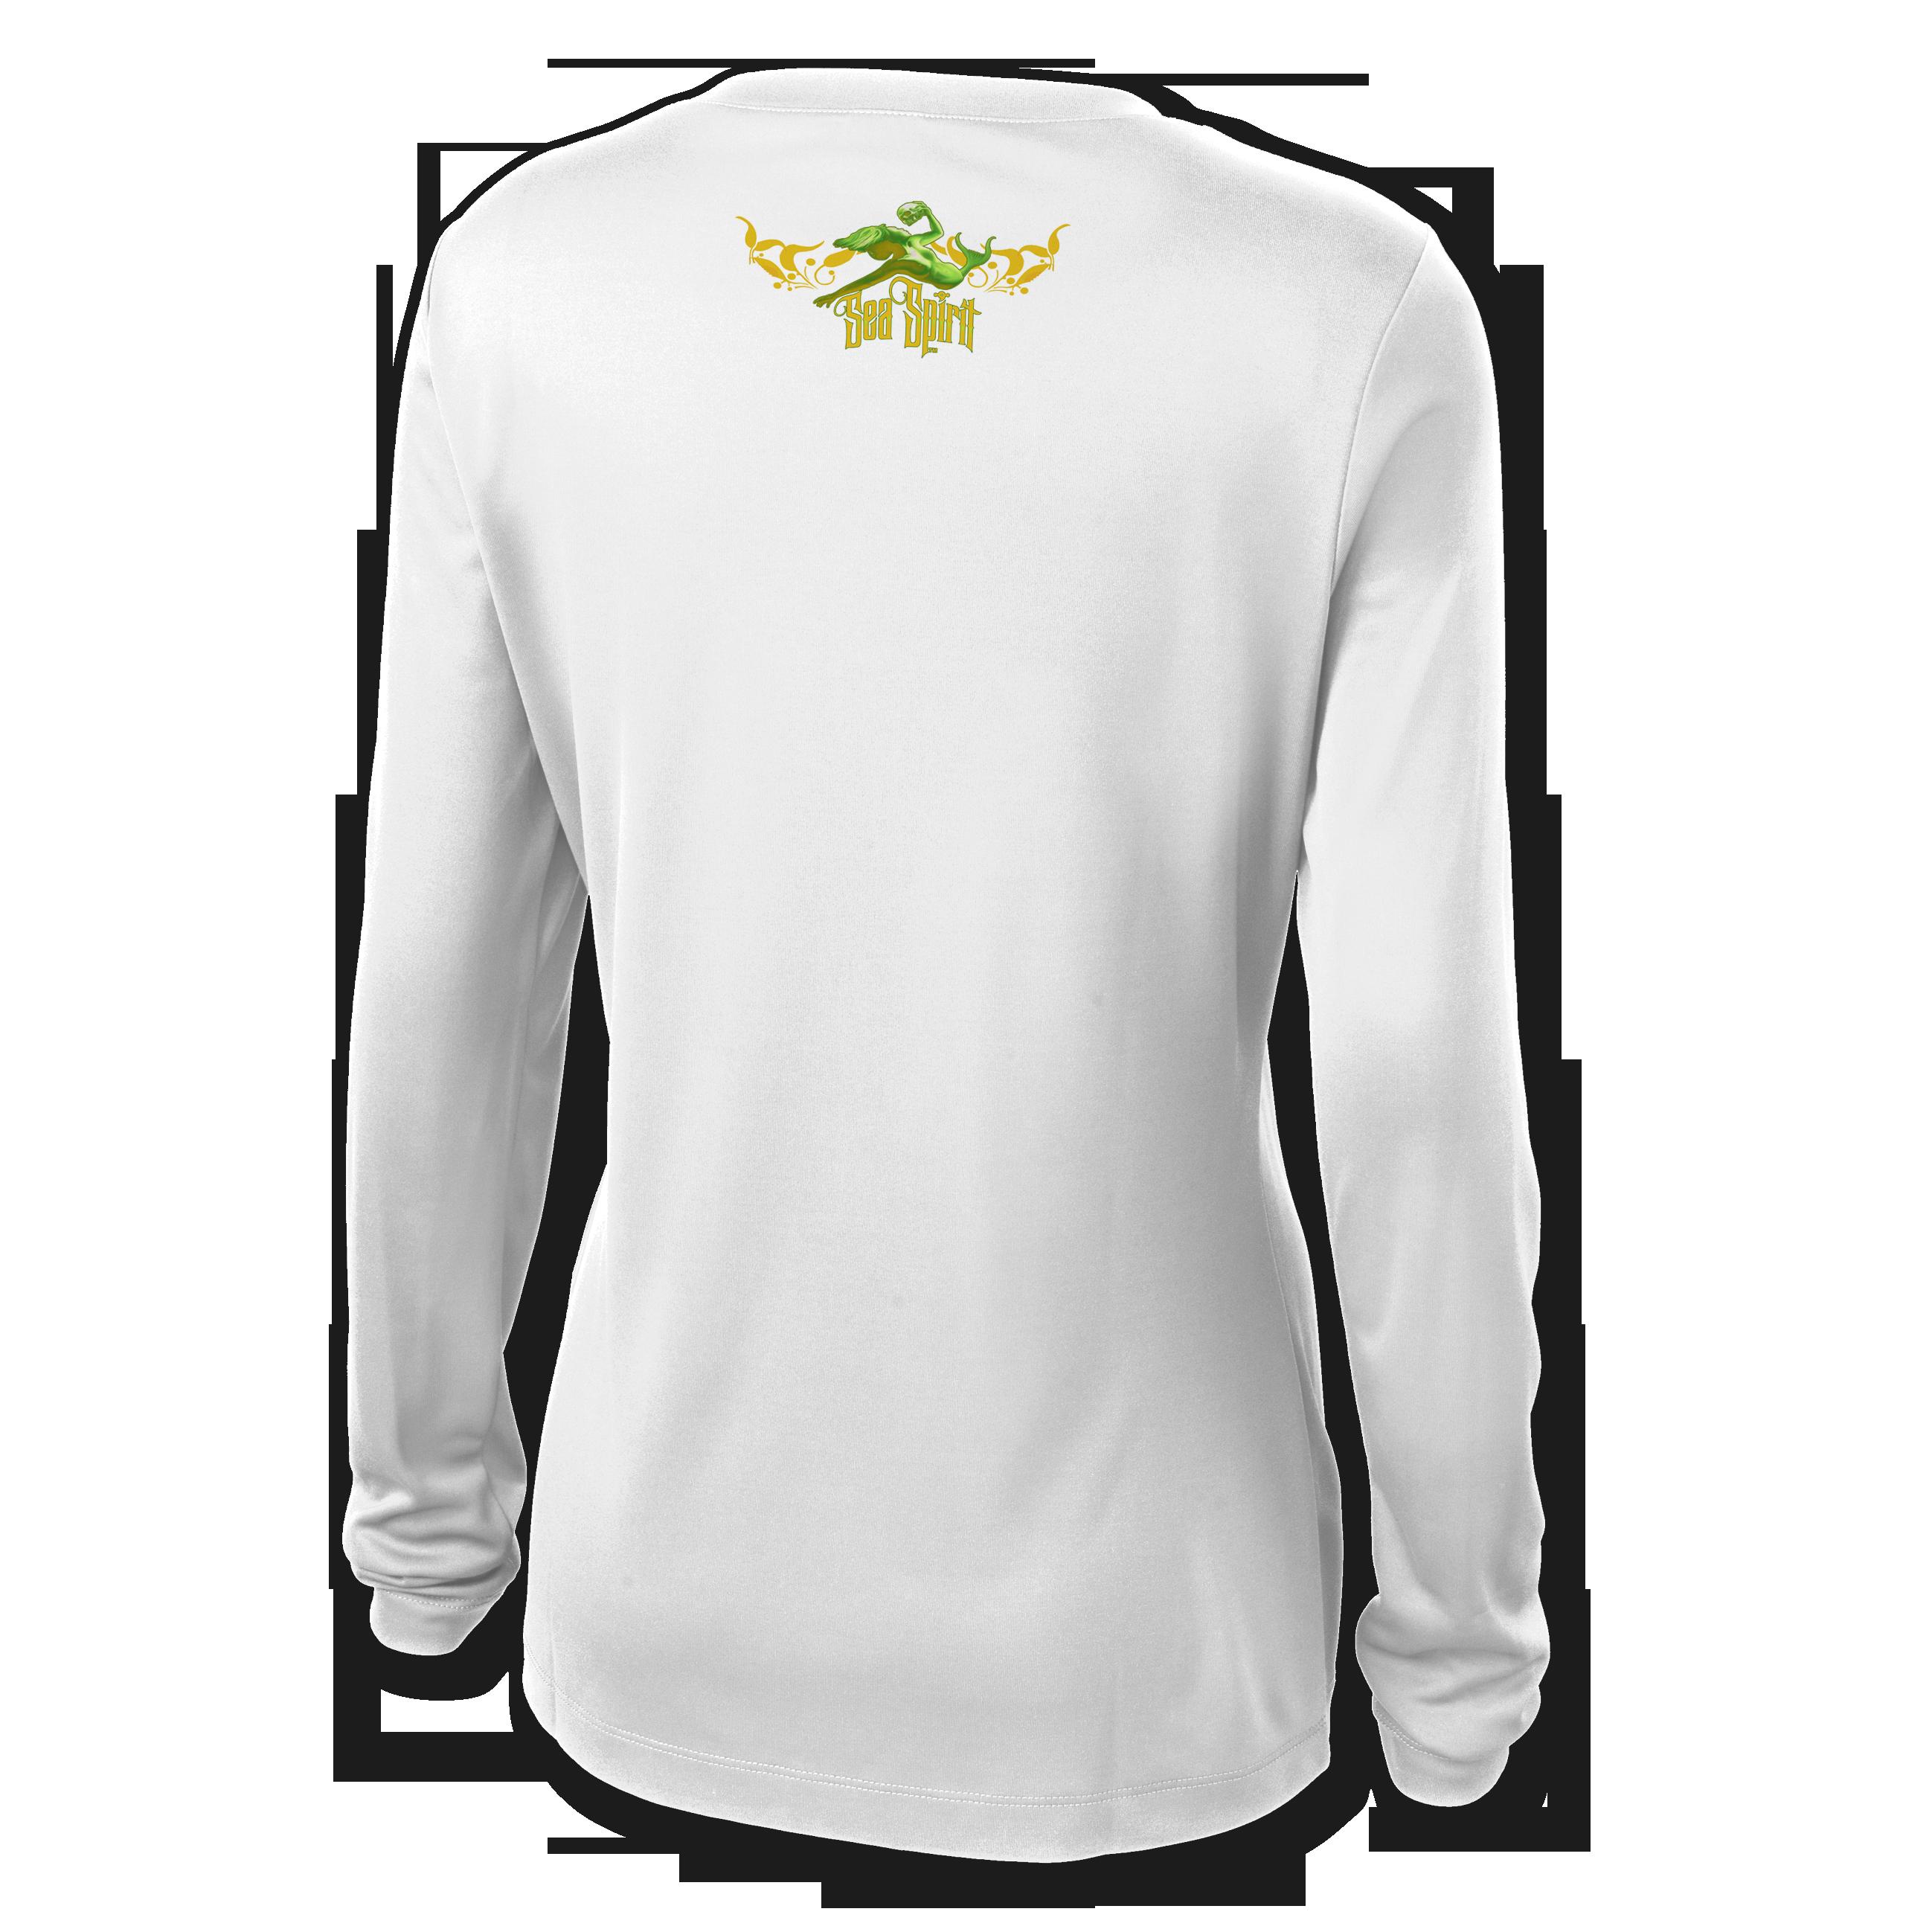 jason-mathias-sea-spirit-womens-v-neck-mahi-dorado-dolphin-shirt-white-back.png